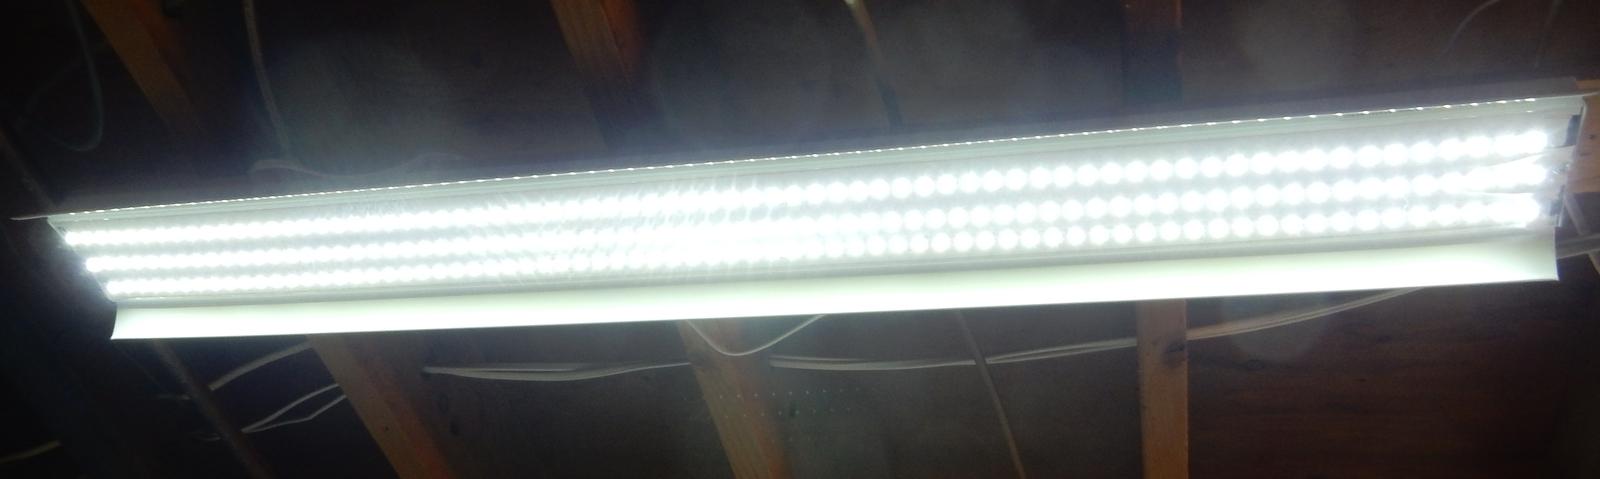 Kit: 100W Power Supply+ 2x 8' LED Strips, Bright White, Hi-Lumen